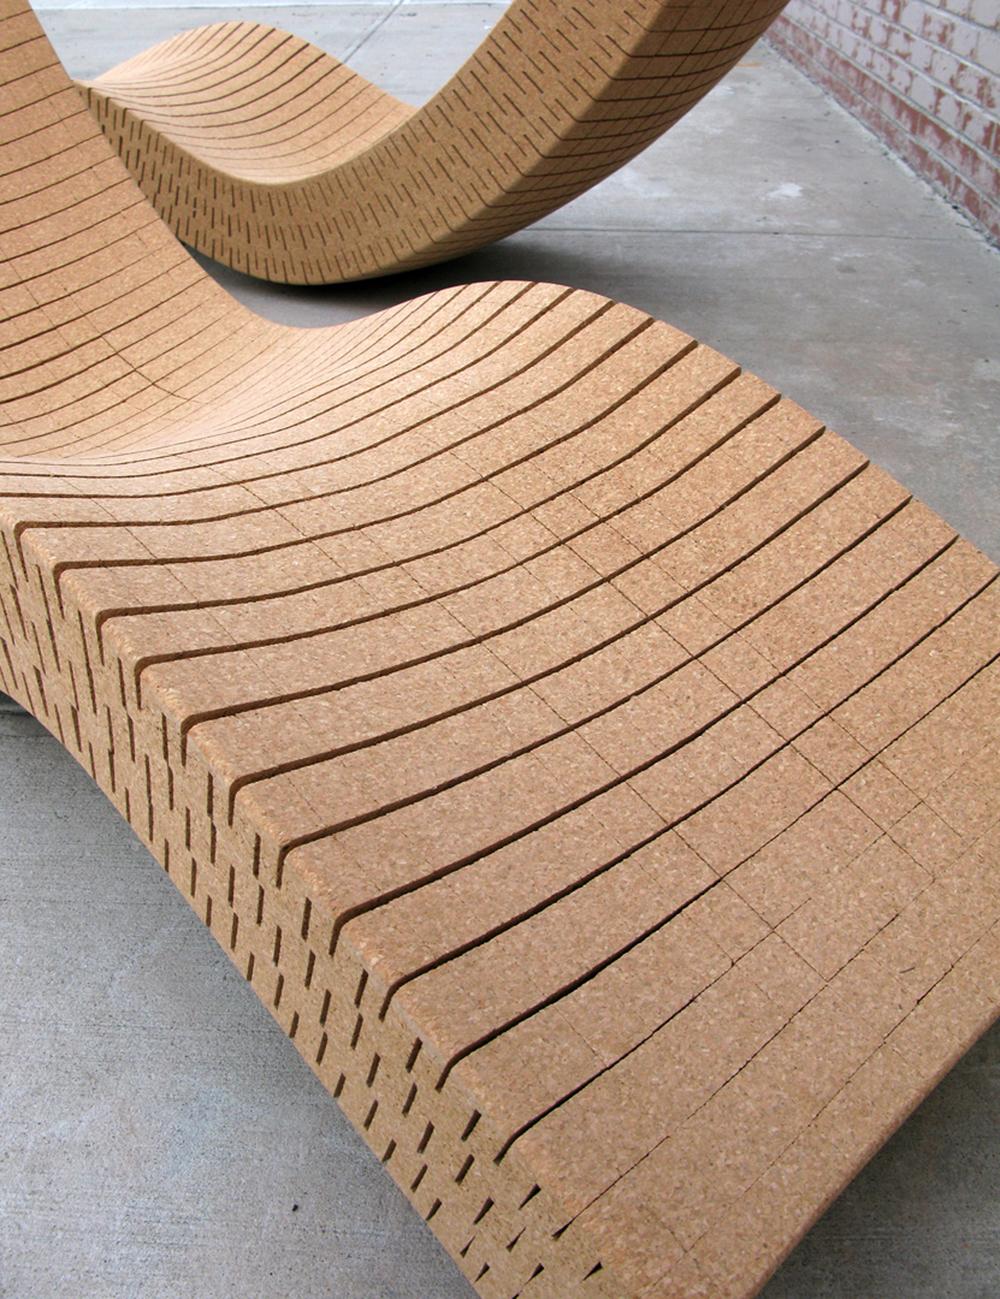 Cortiça chaise longue (detail)